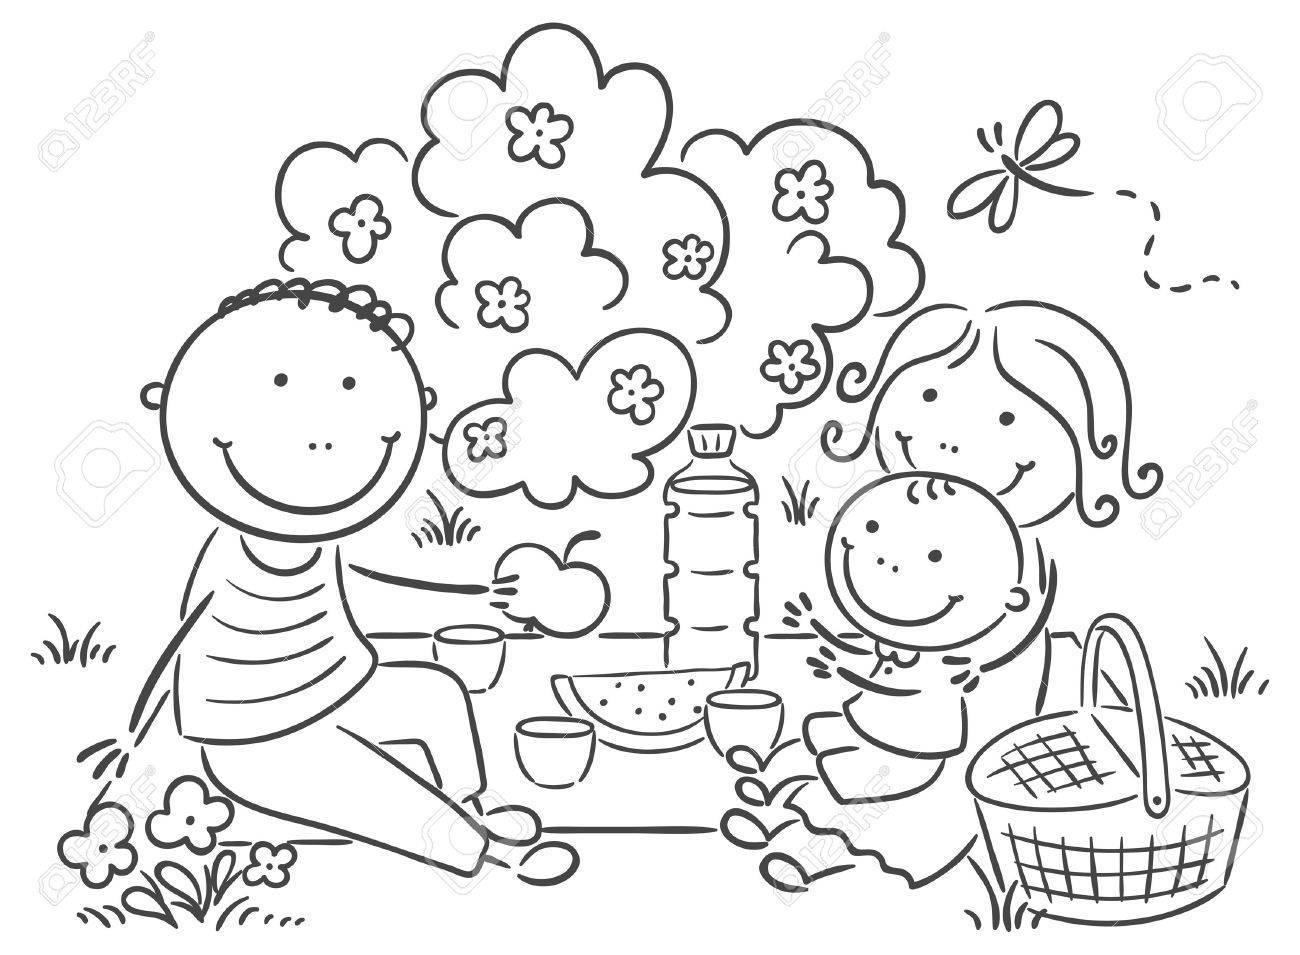 Family picnic clipart black and white 5 » Clipart Portal.